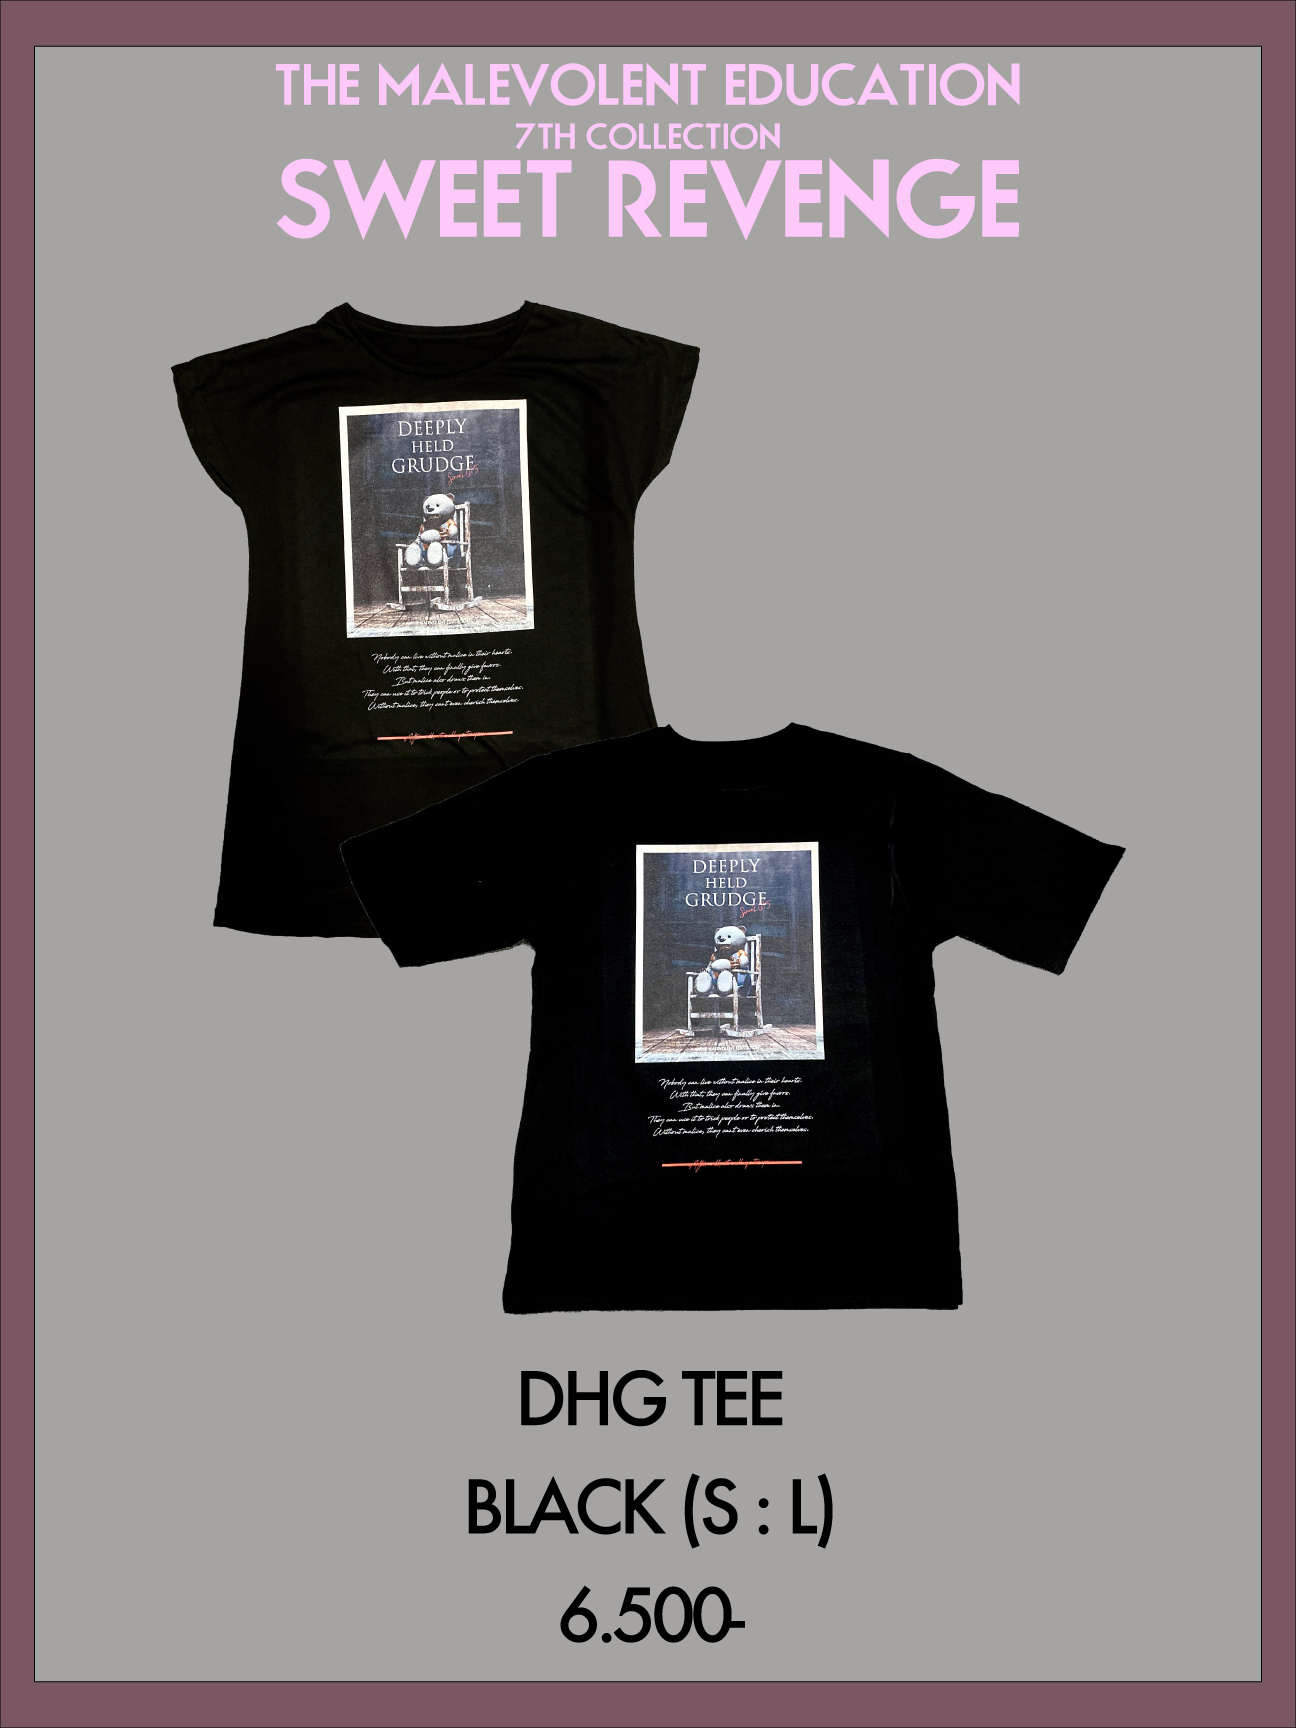 DHG TEE(BLACK) S / L